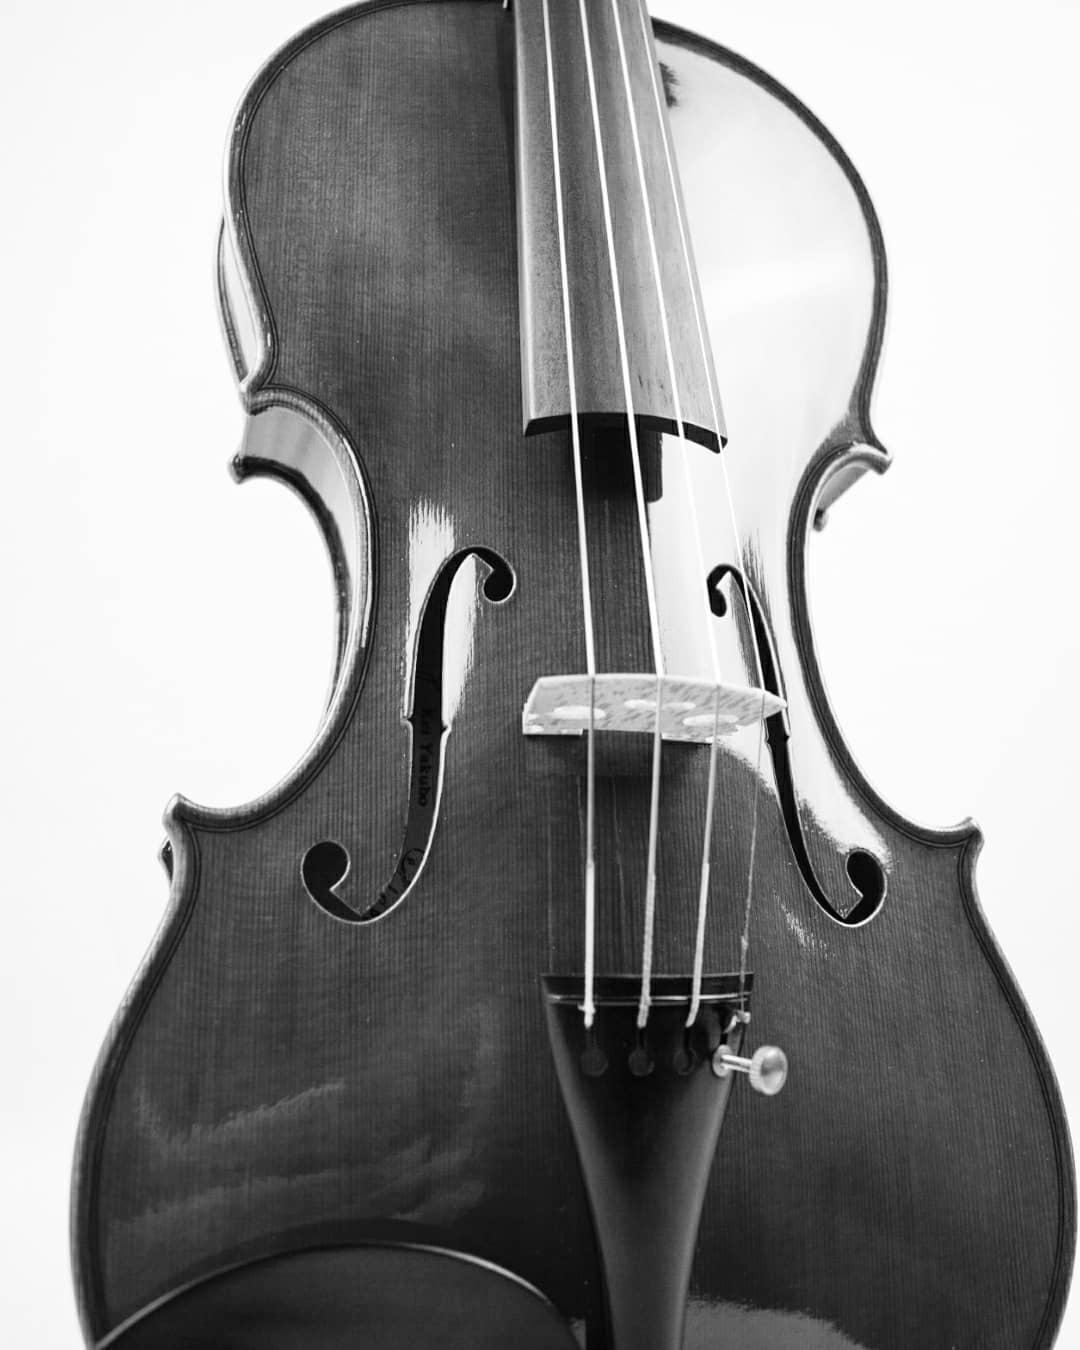 Violino 2020mod. Guarneri#沖縄 #琉球 #violin #viola #cello #contrabass #バイオリン #ビオラ #チェロ #コントラバス #ryukyu #okinawa